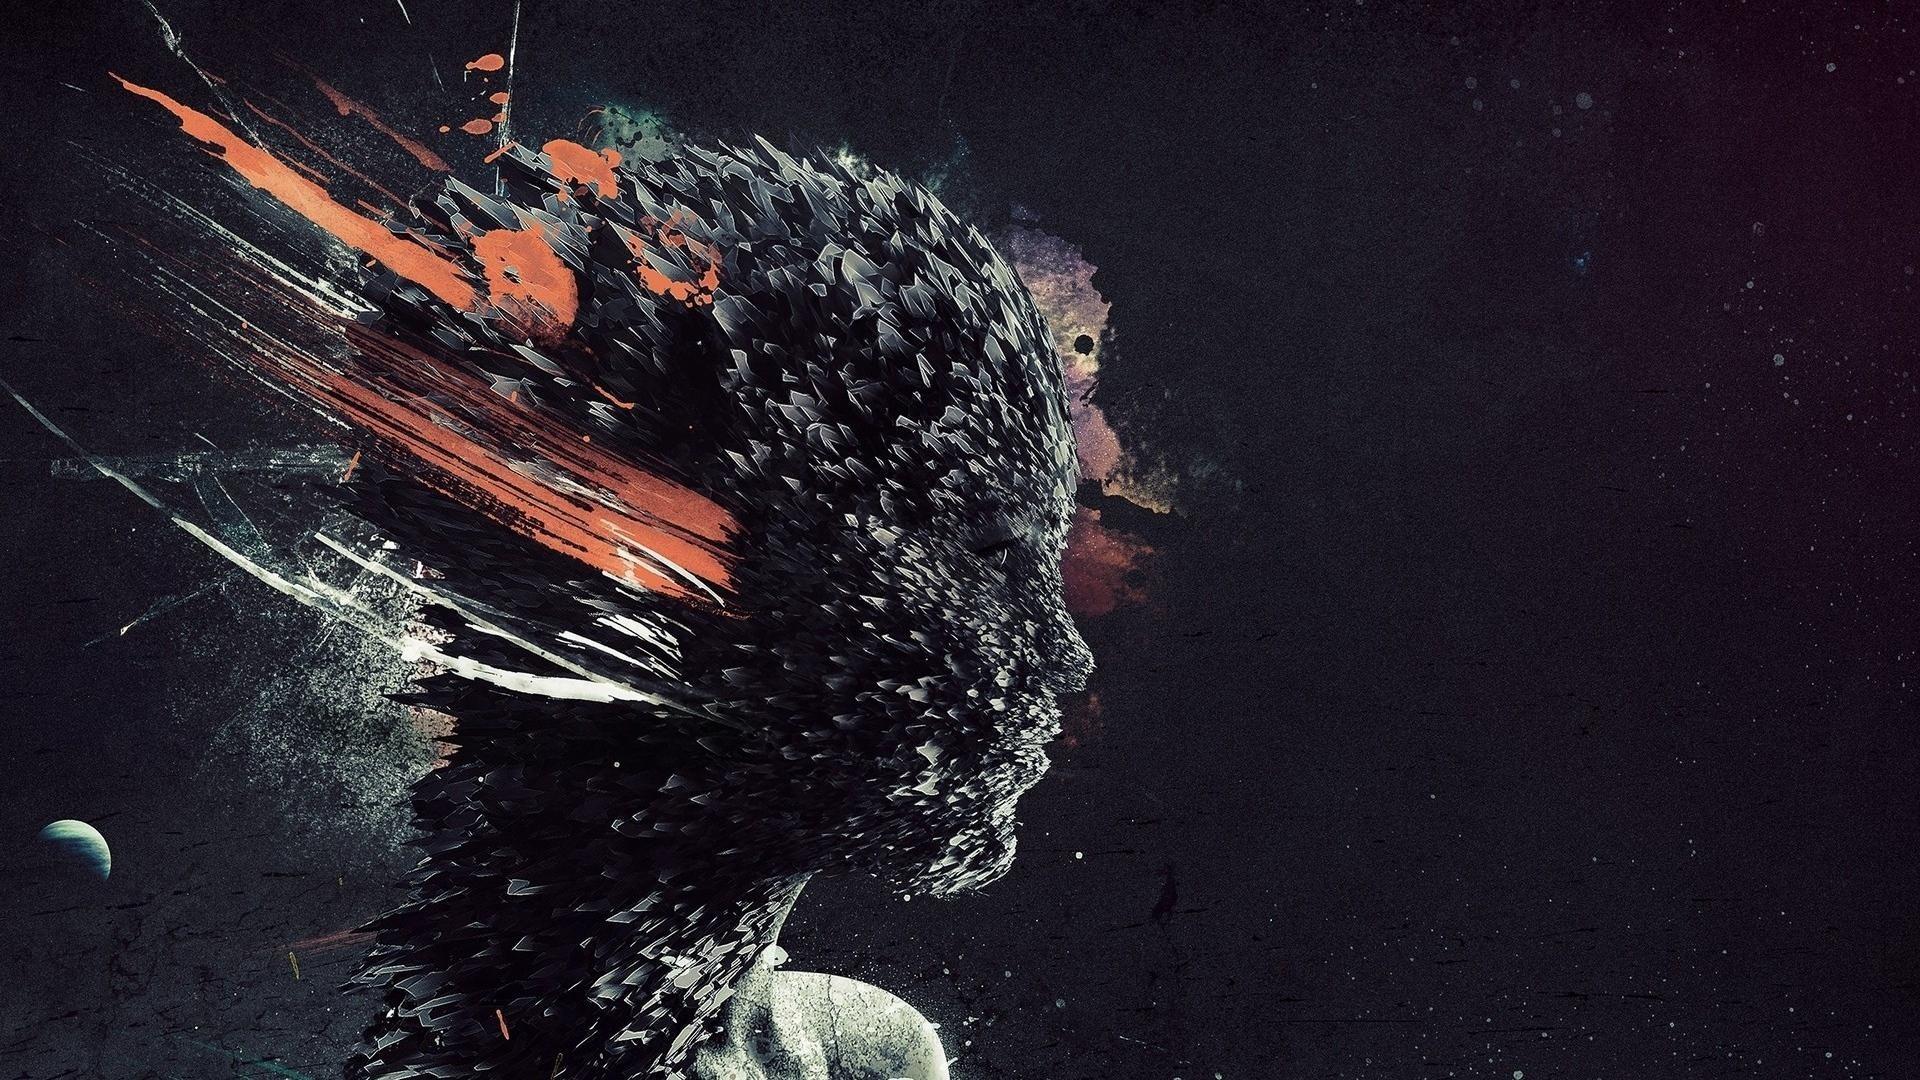 art-woman-face-explosion-stone-art-Desktop-Backgrounds-